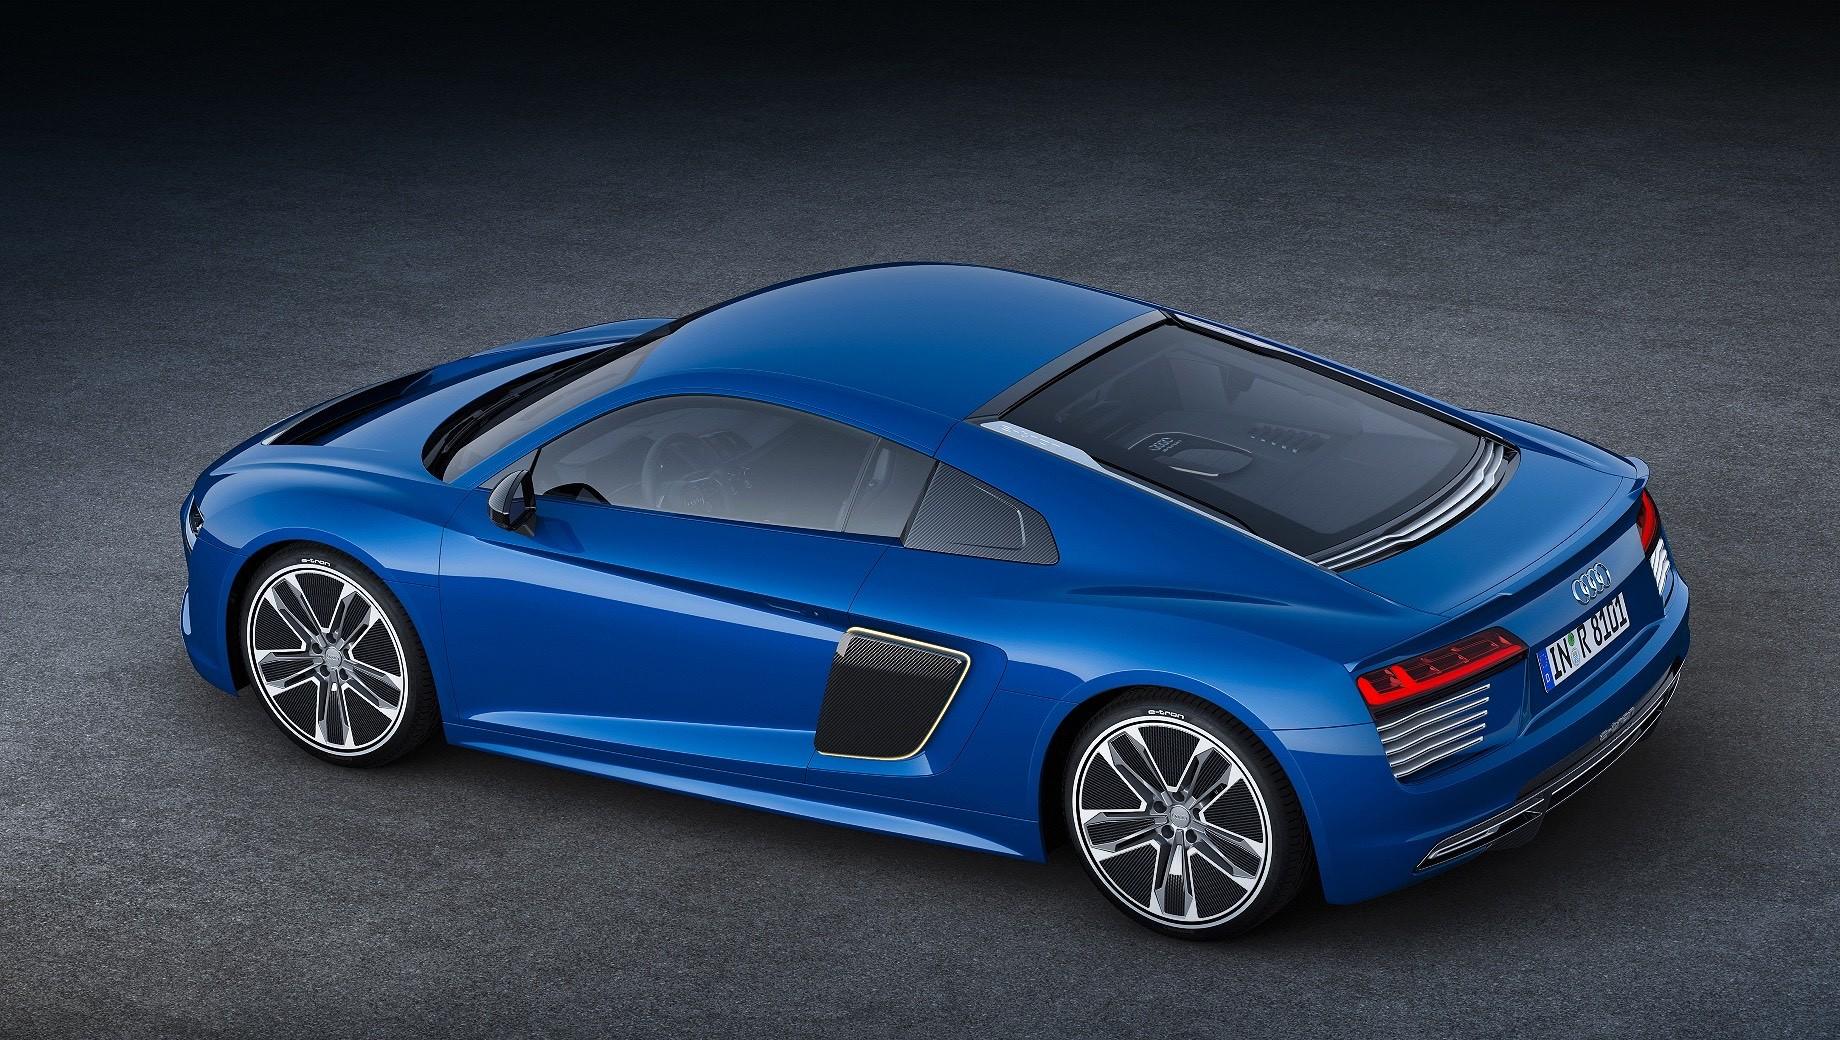 Audi tt,Audi r8. Audi R8 уже была электрокаром в исполнении e-tron. Суперкар получил два электродвигателя на задней оси (суммарно 462 л.с. и 920 Н•м), а разгон до сотни занимал 3,9 с. Запас хода на заряженном аккумуляторе — 450 км. Но цена в миллион евро определила тираж — менее ста машин с 2015 по 2016 год.